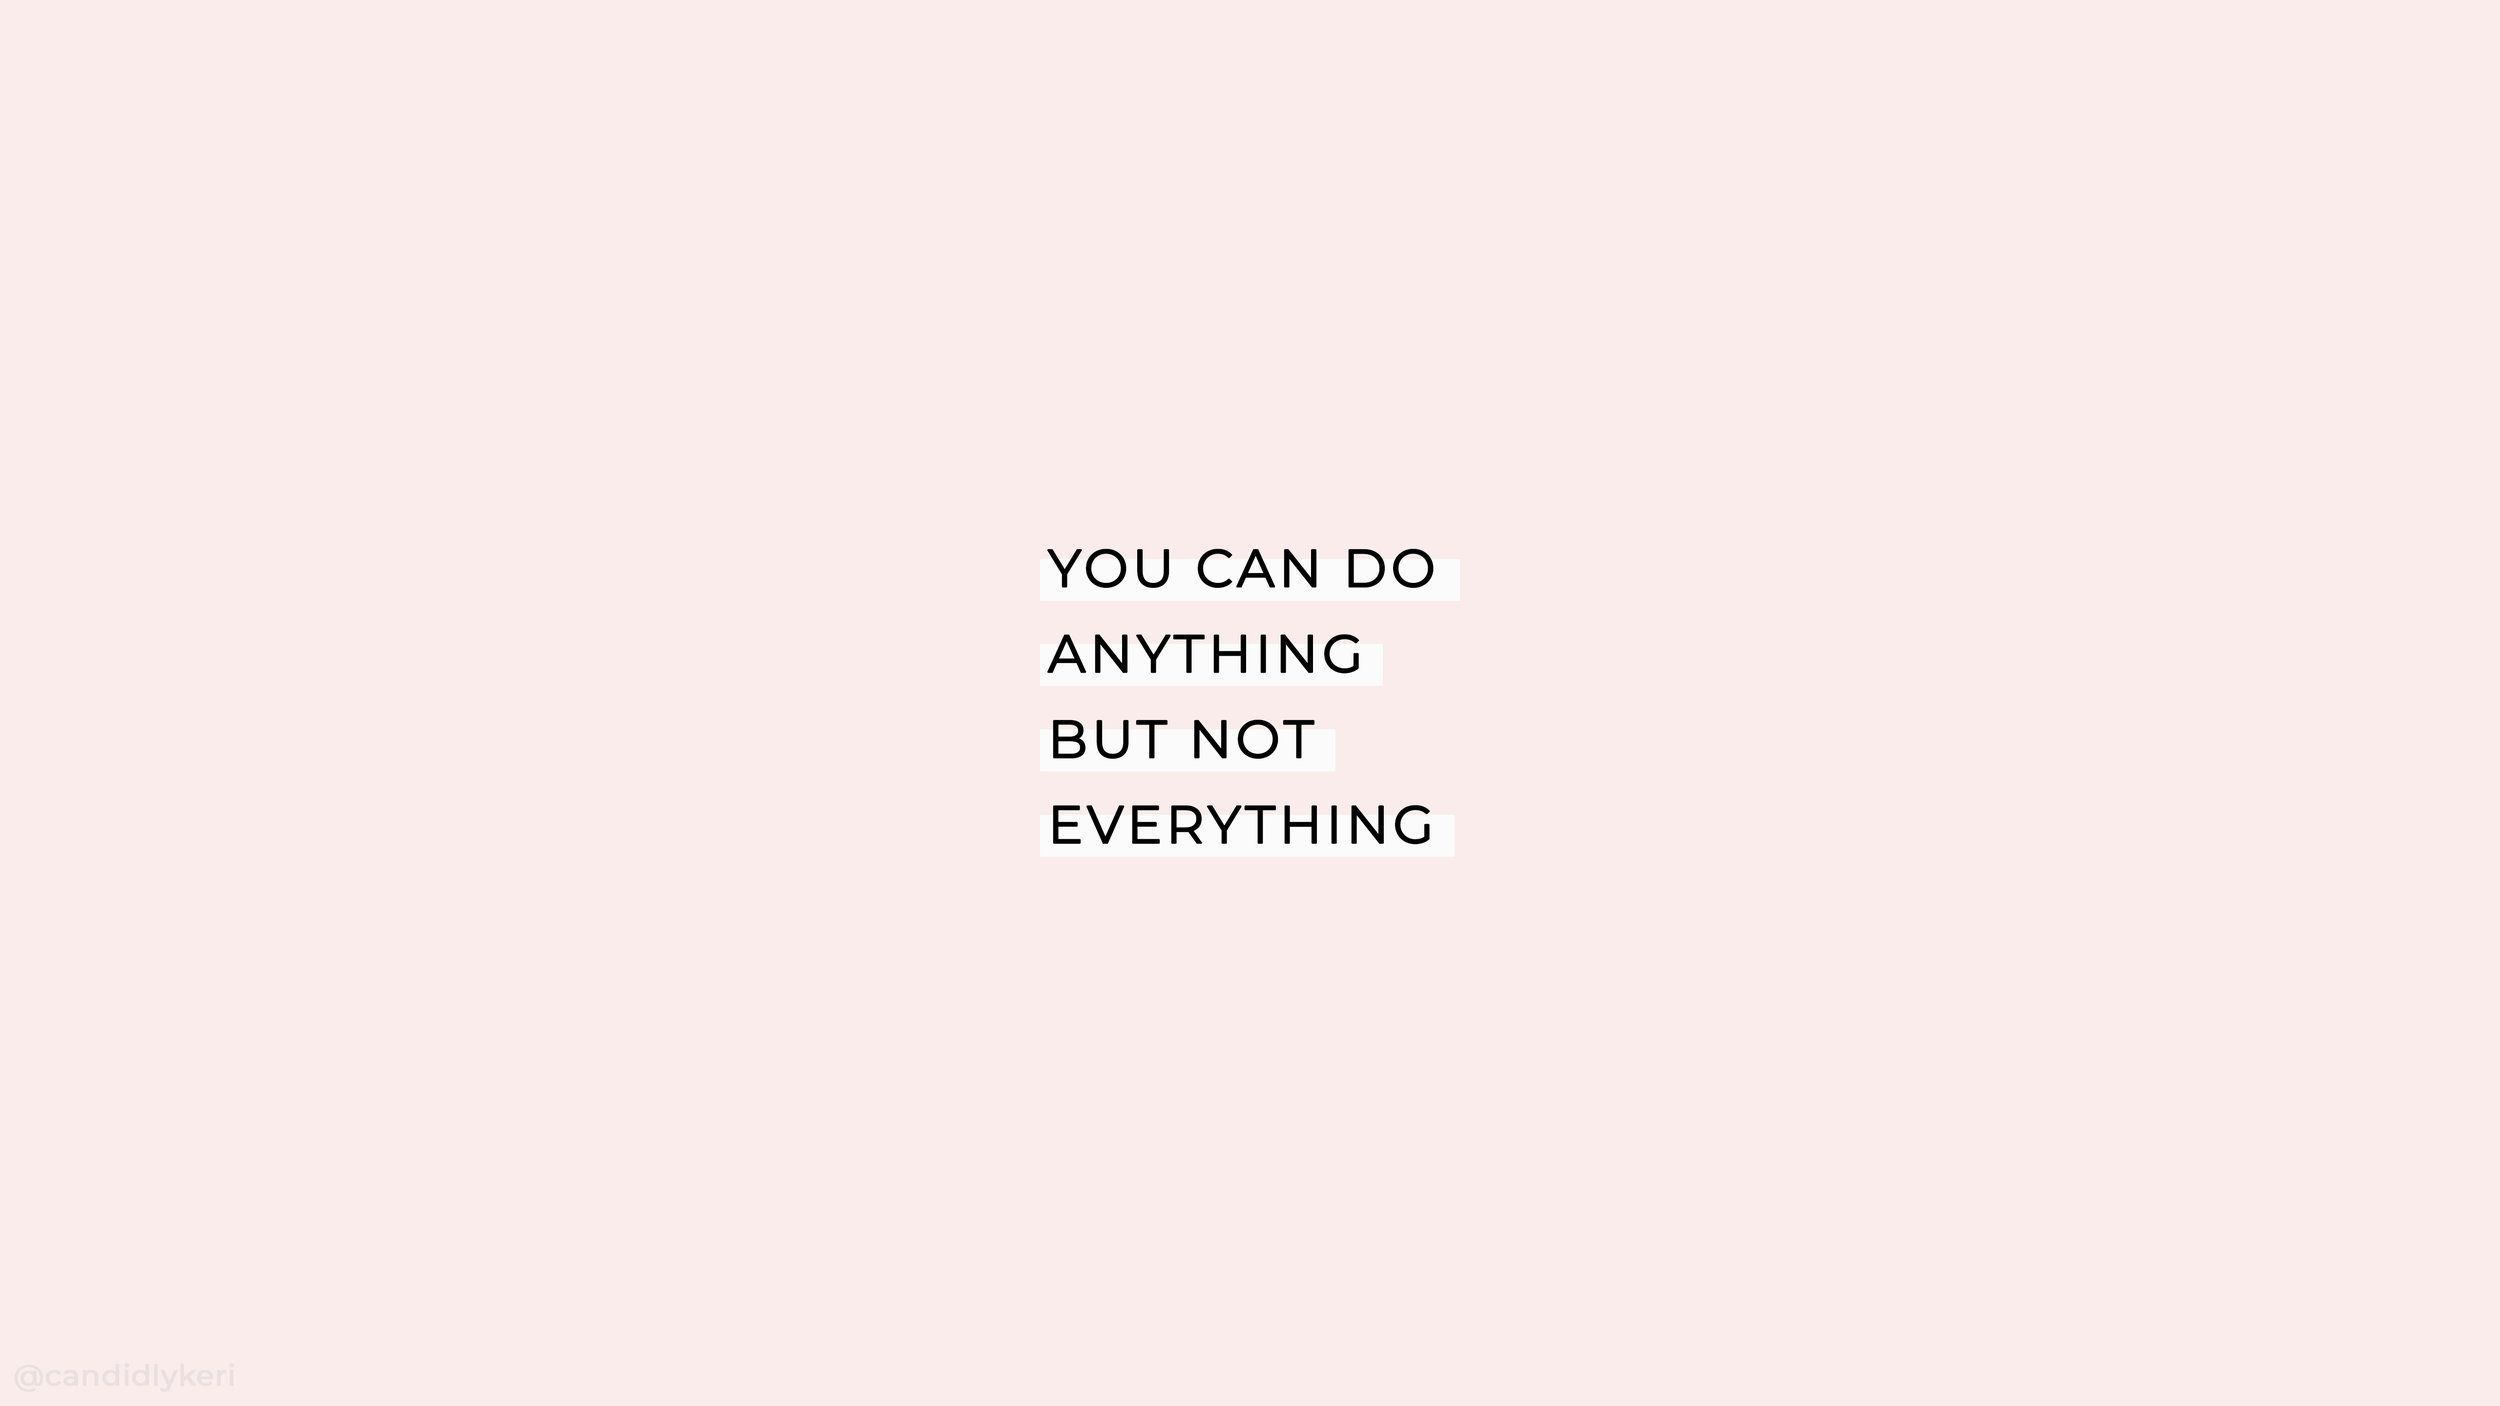 Motivational Quotes Aesthetic Desktop Wallpapers Top Free Motivational Quotes Aesthetic Desktop Backgrounds Wallpaperaccess